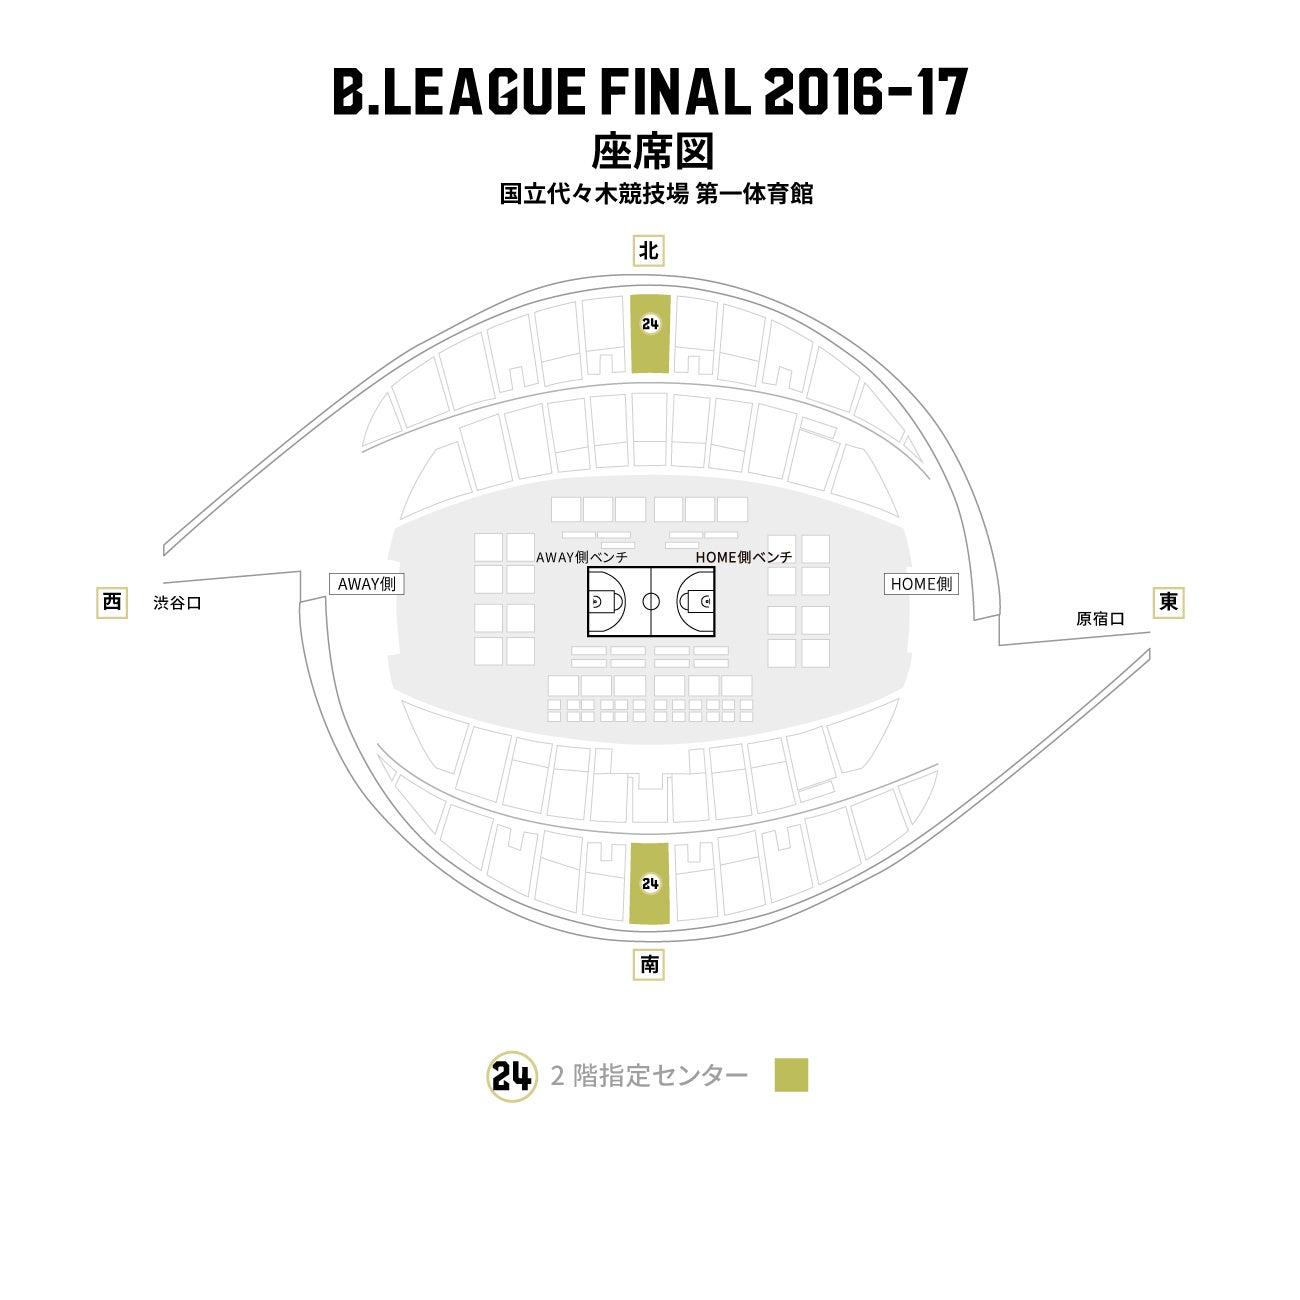 seatview_final_seat_24.jpg